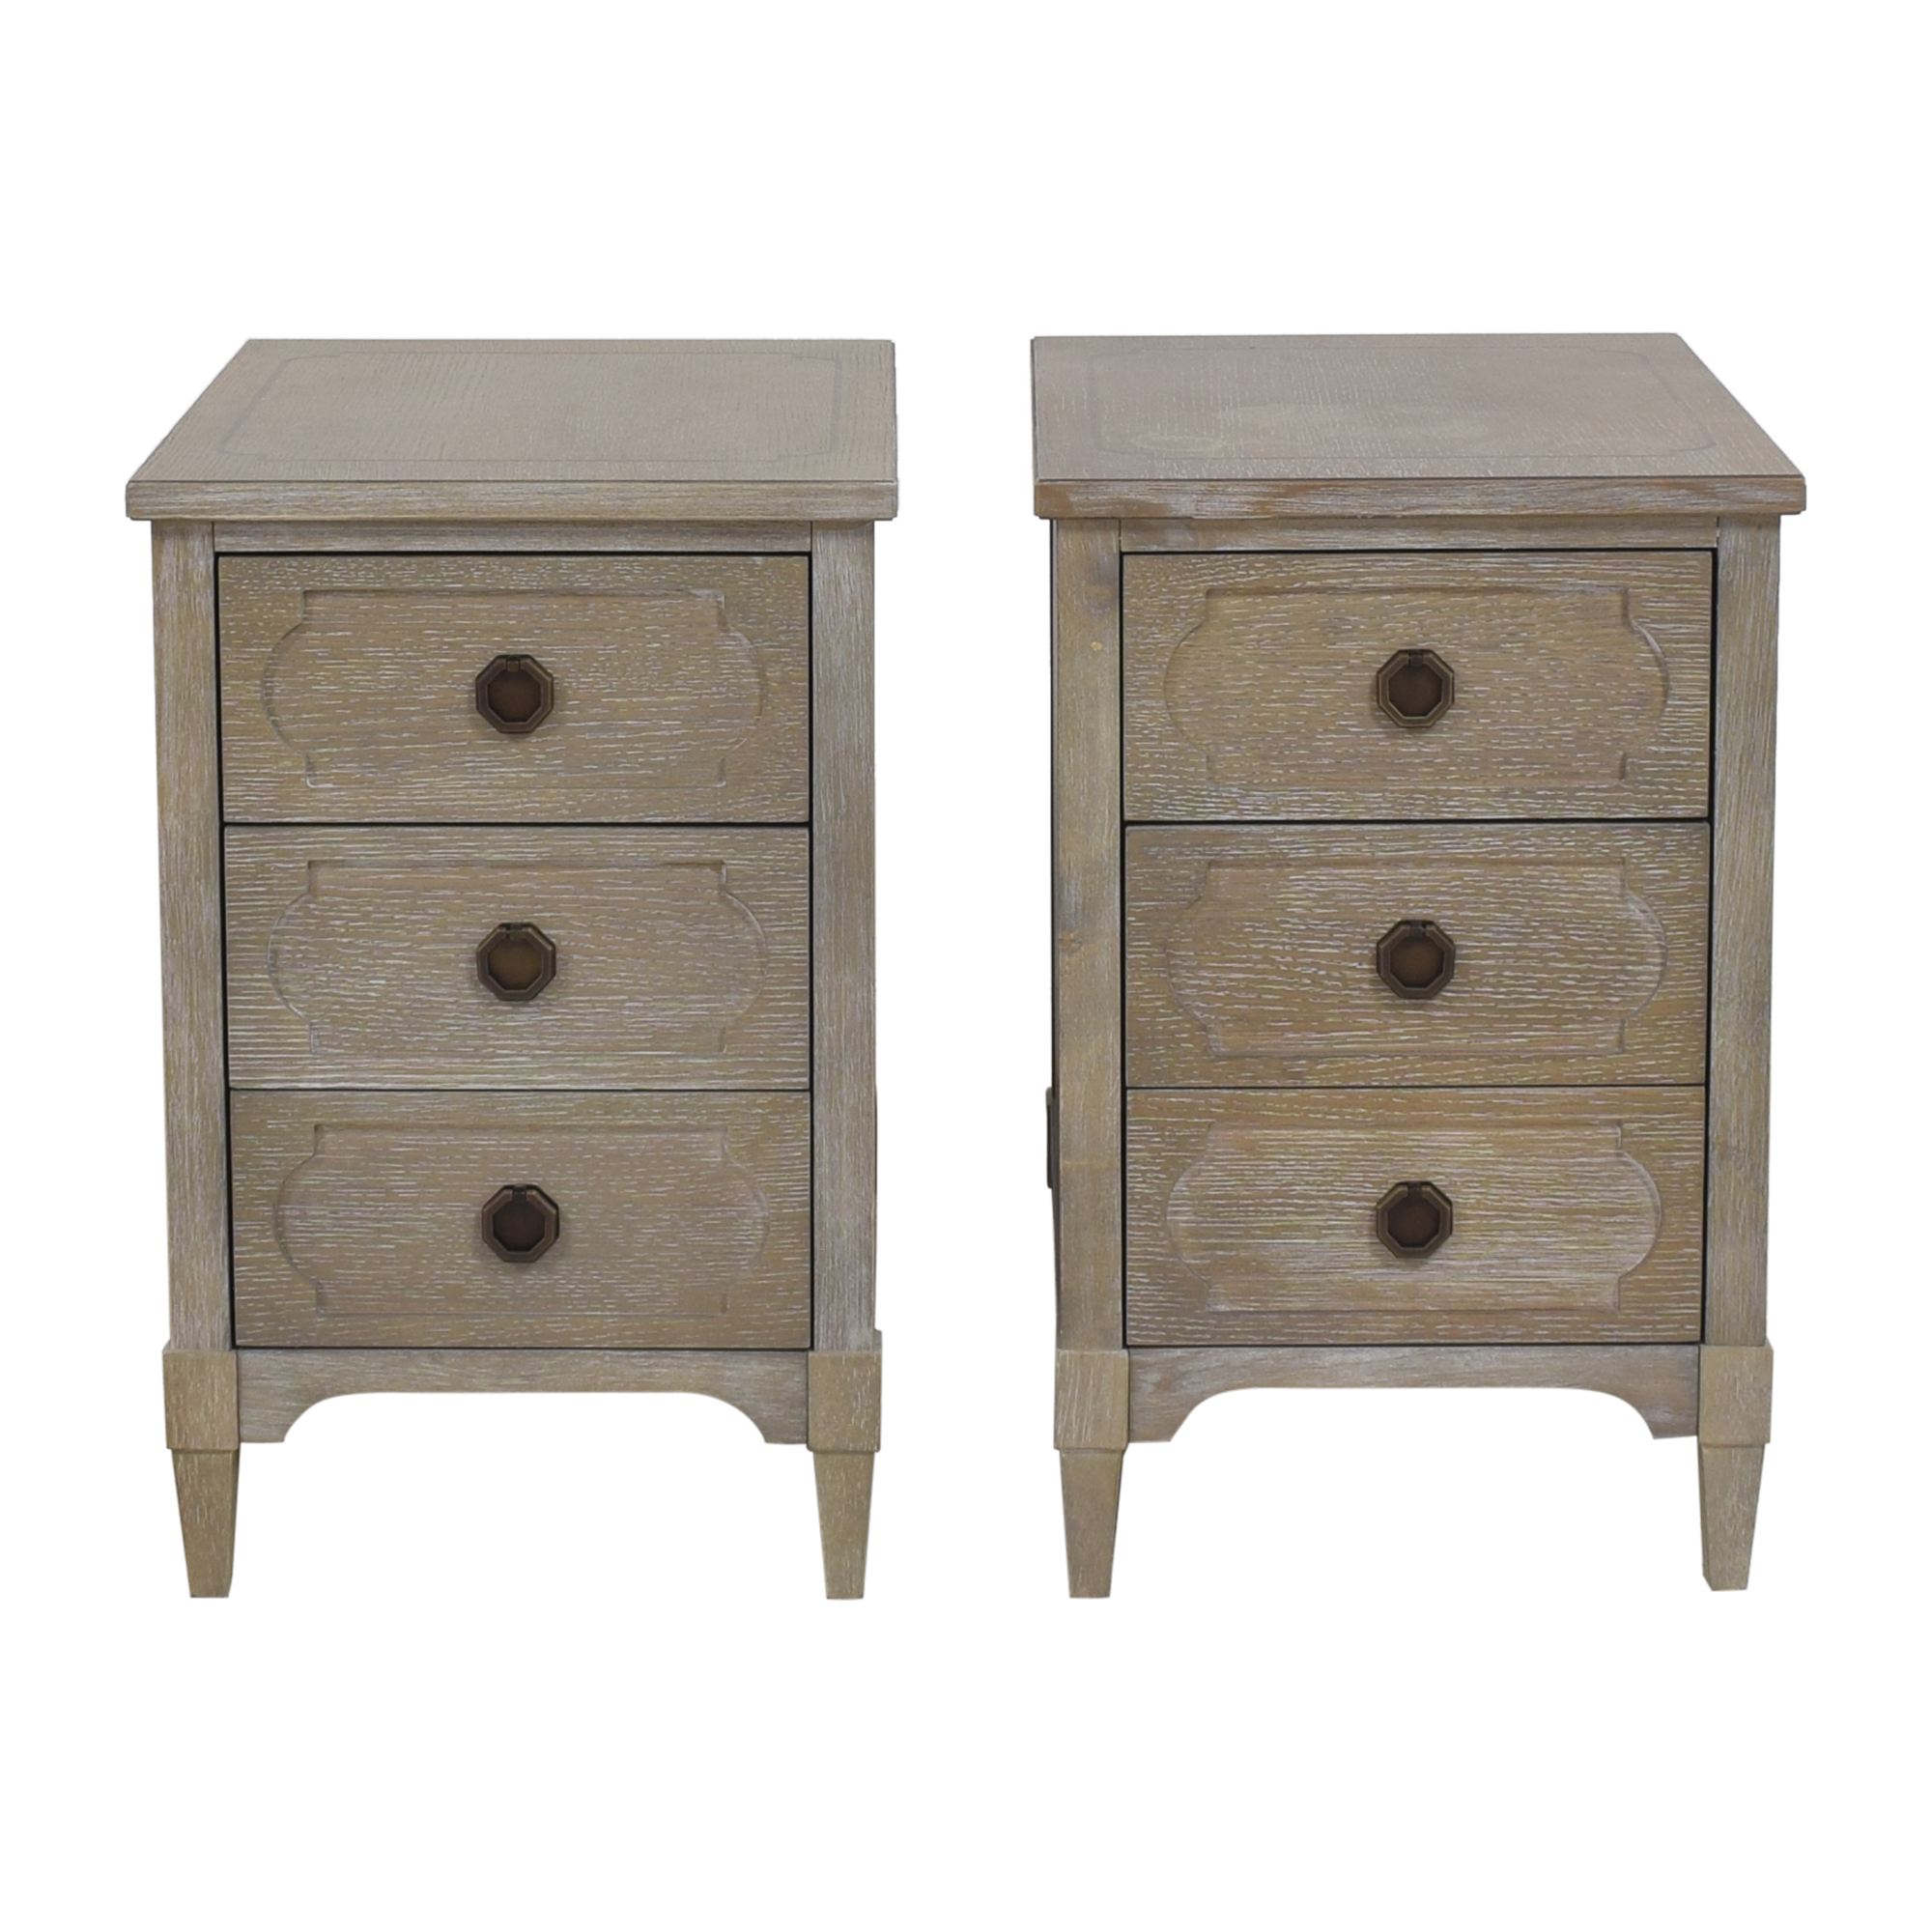 buy Universal Furniture Universal Furniture Three Drawer Nightstands online